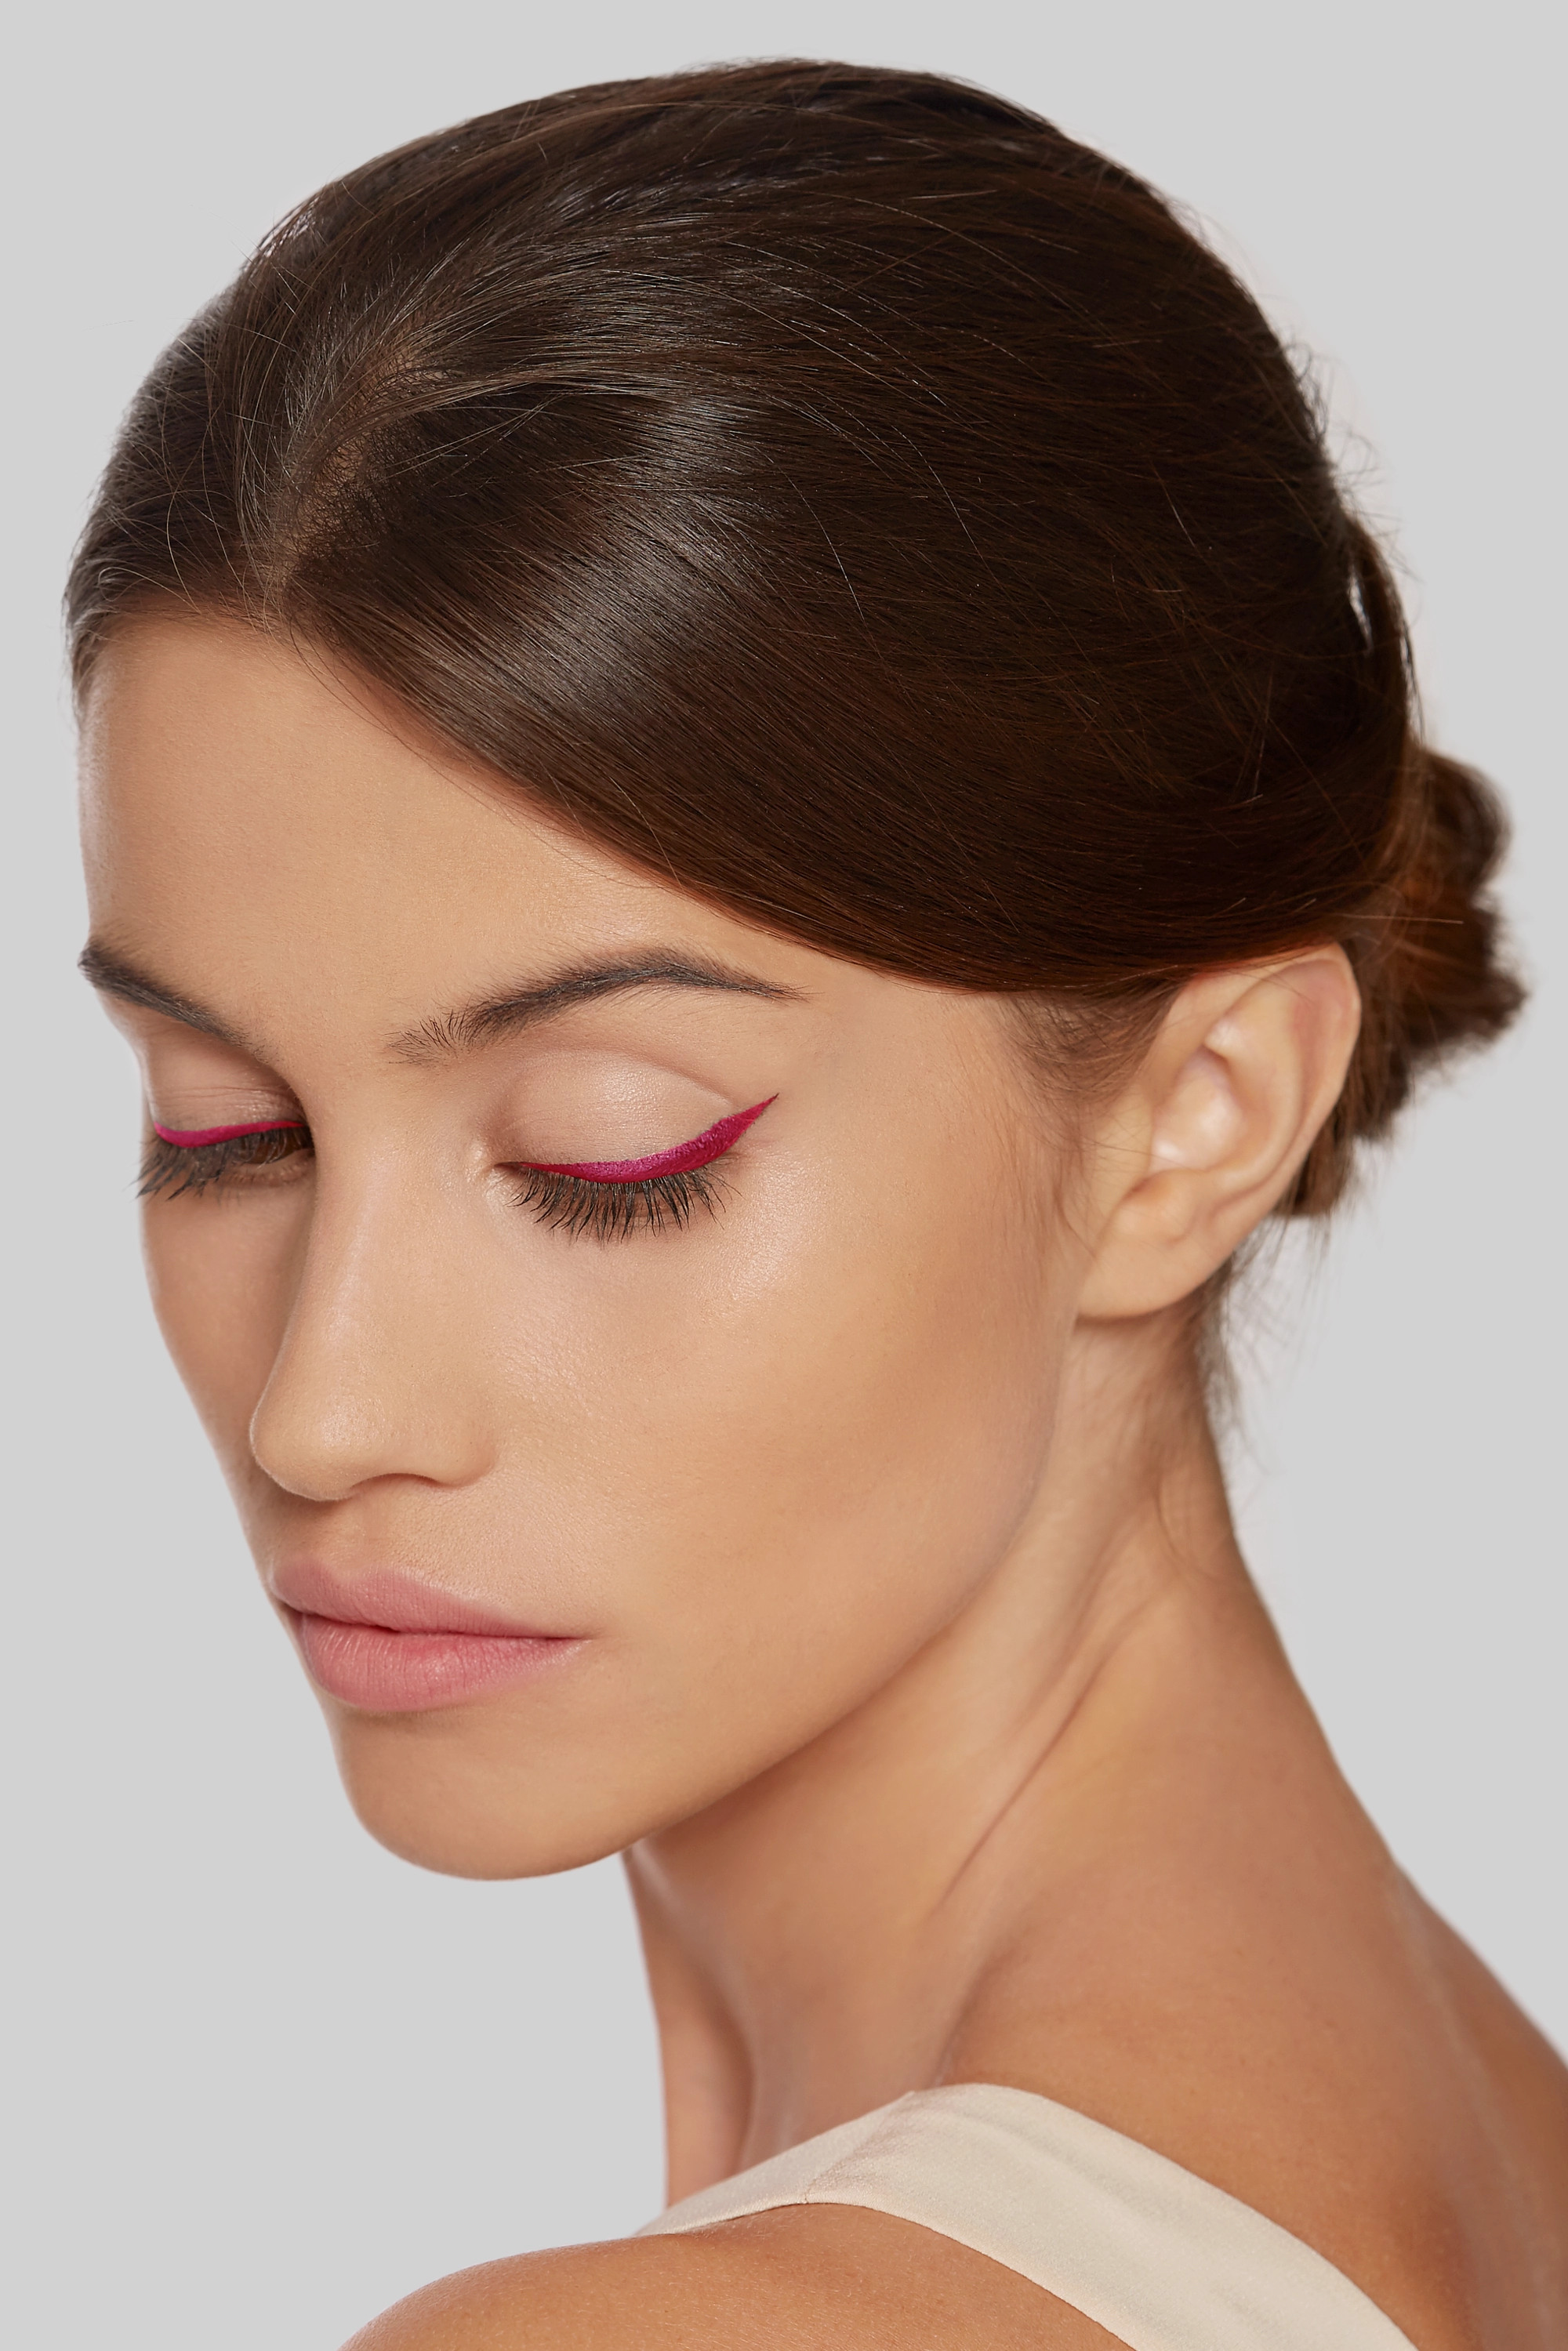 Marc Jacobs Beauty Highliner Liquid-Gel Eyeliner - Back to the Fuchsia